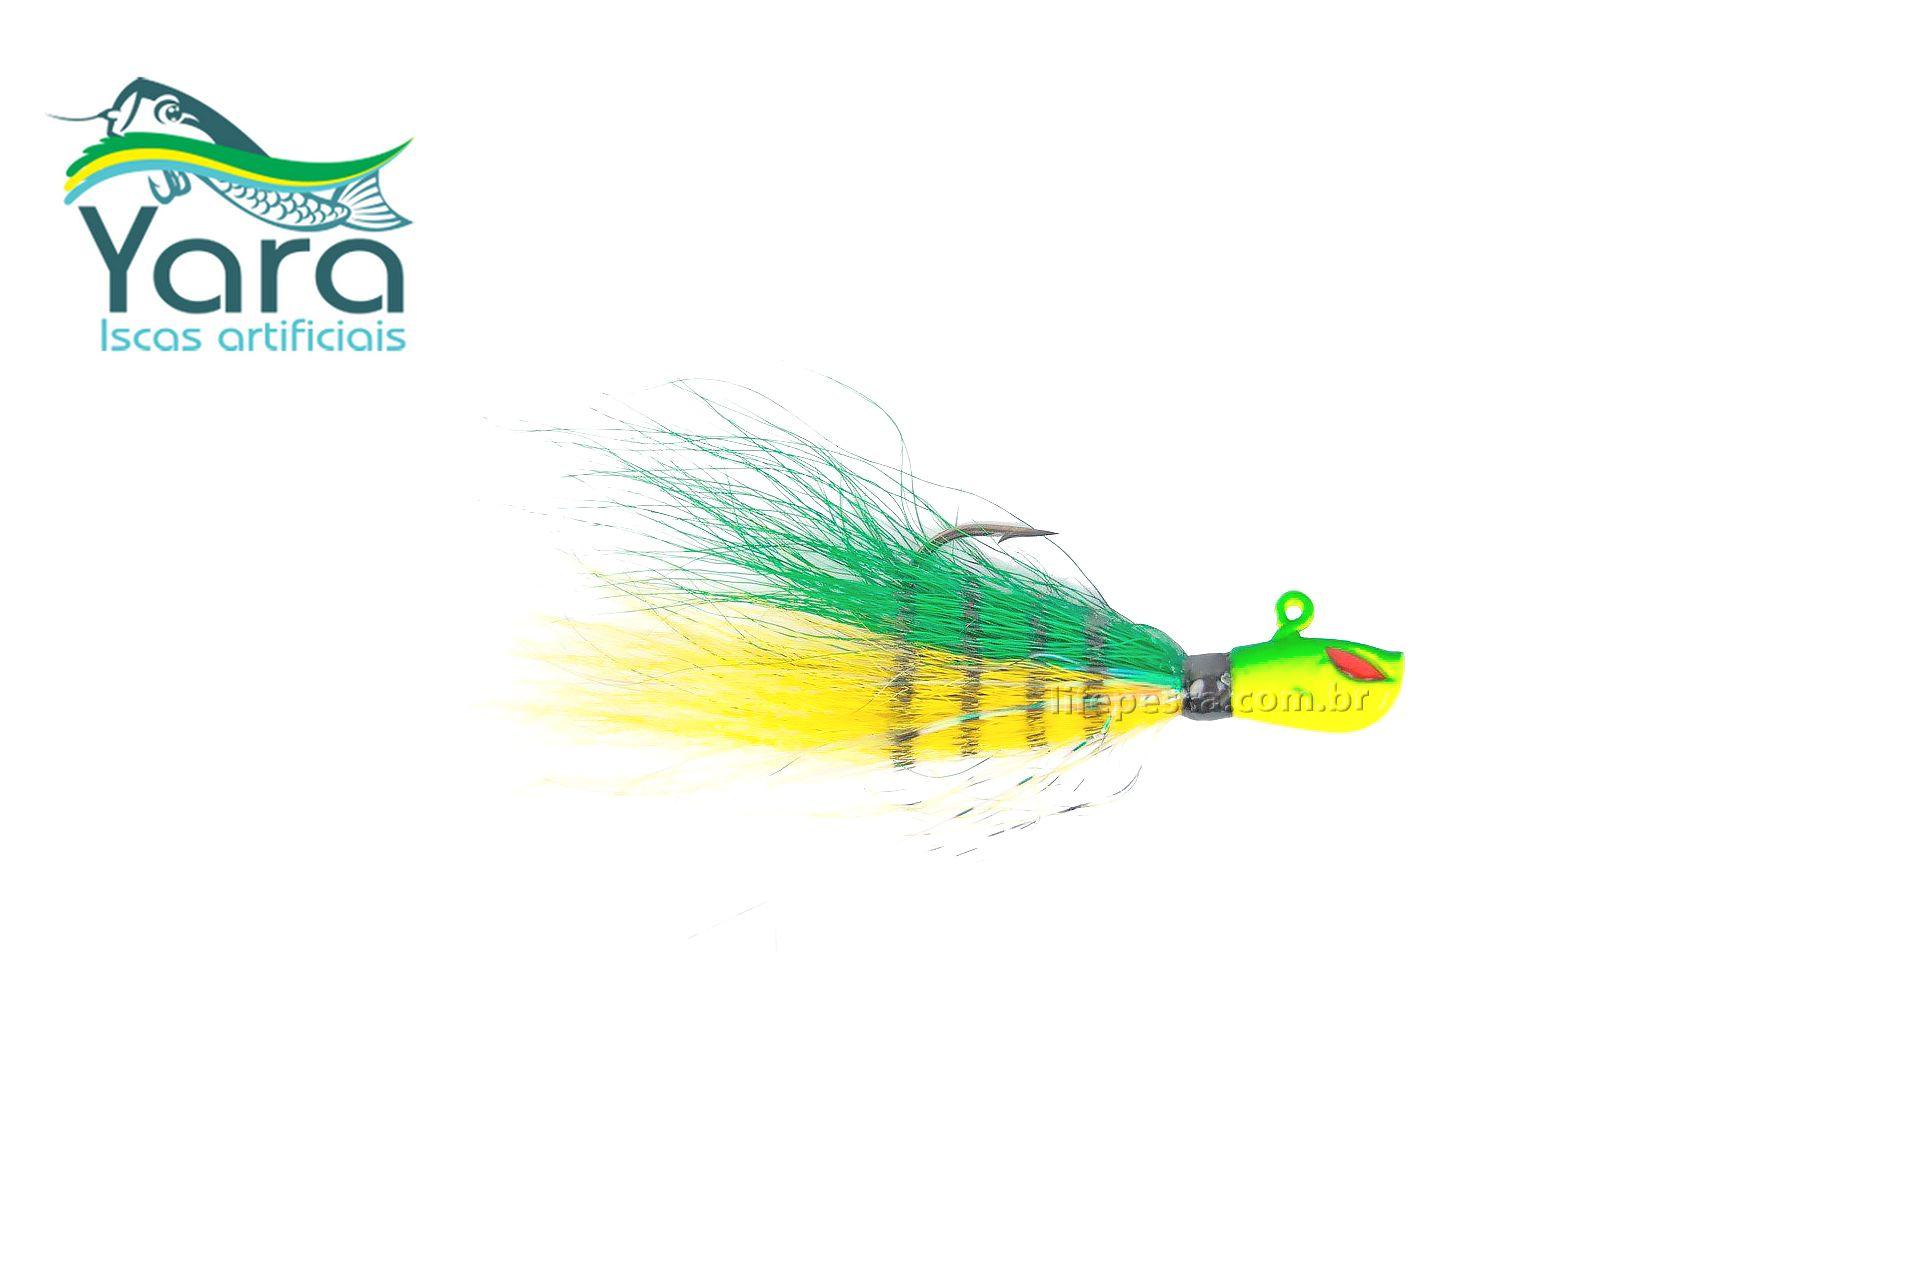 Isca Artificial Yara Killer Jig  (10g) - Várias Cores